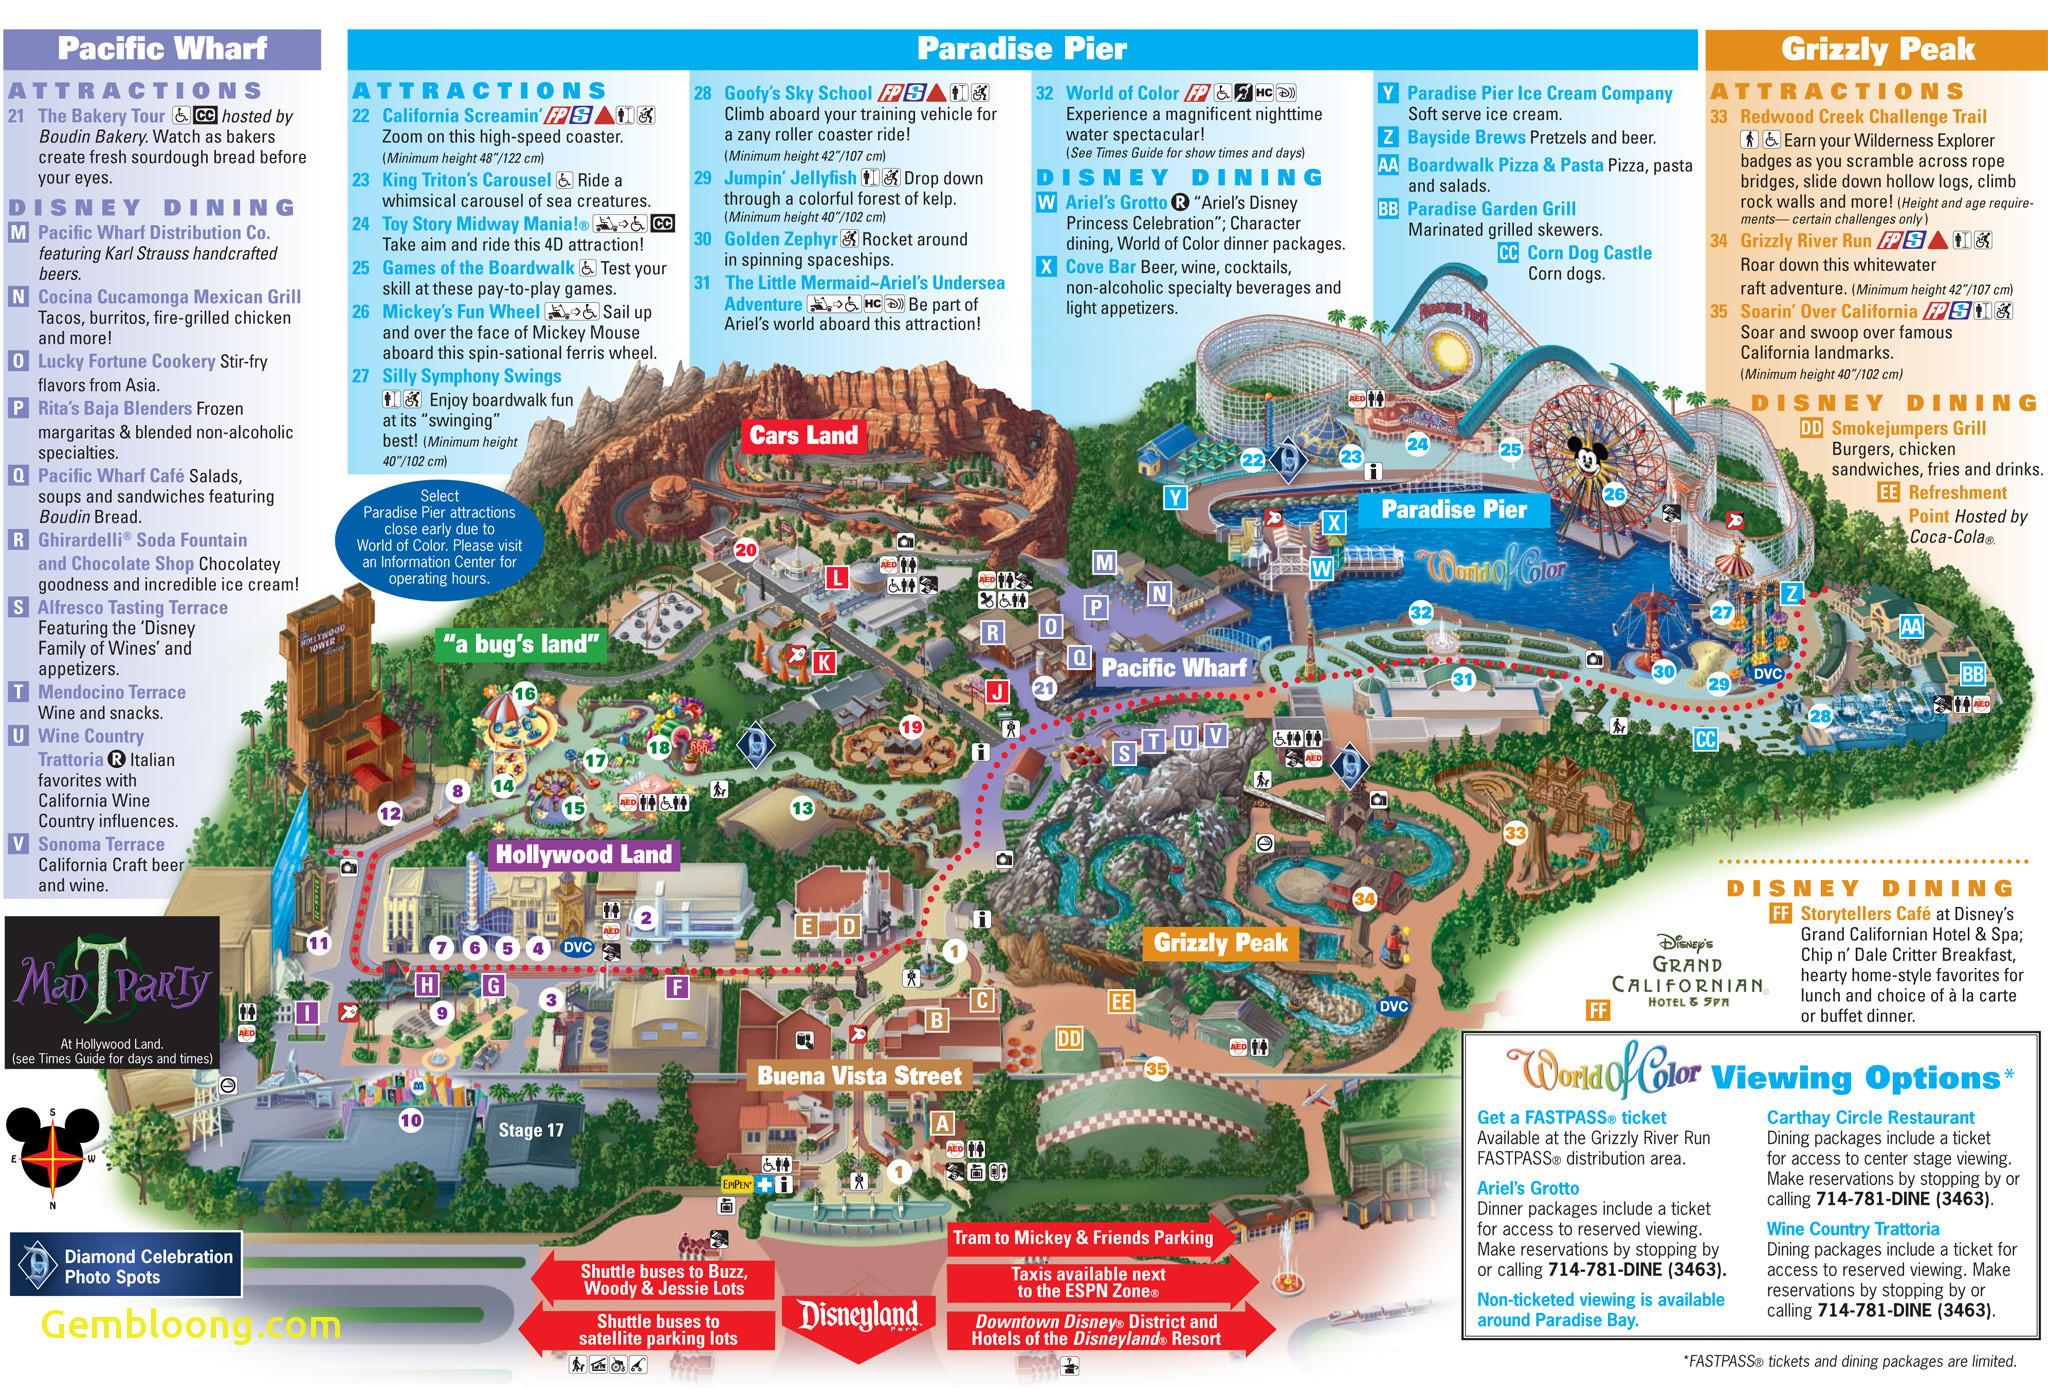 Disneyland California Map From Etiforum 5 - Judecelestin2010 - Disneyland Map 2018 California